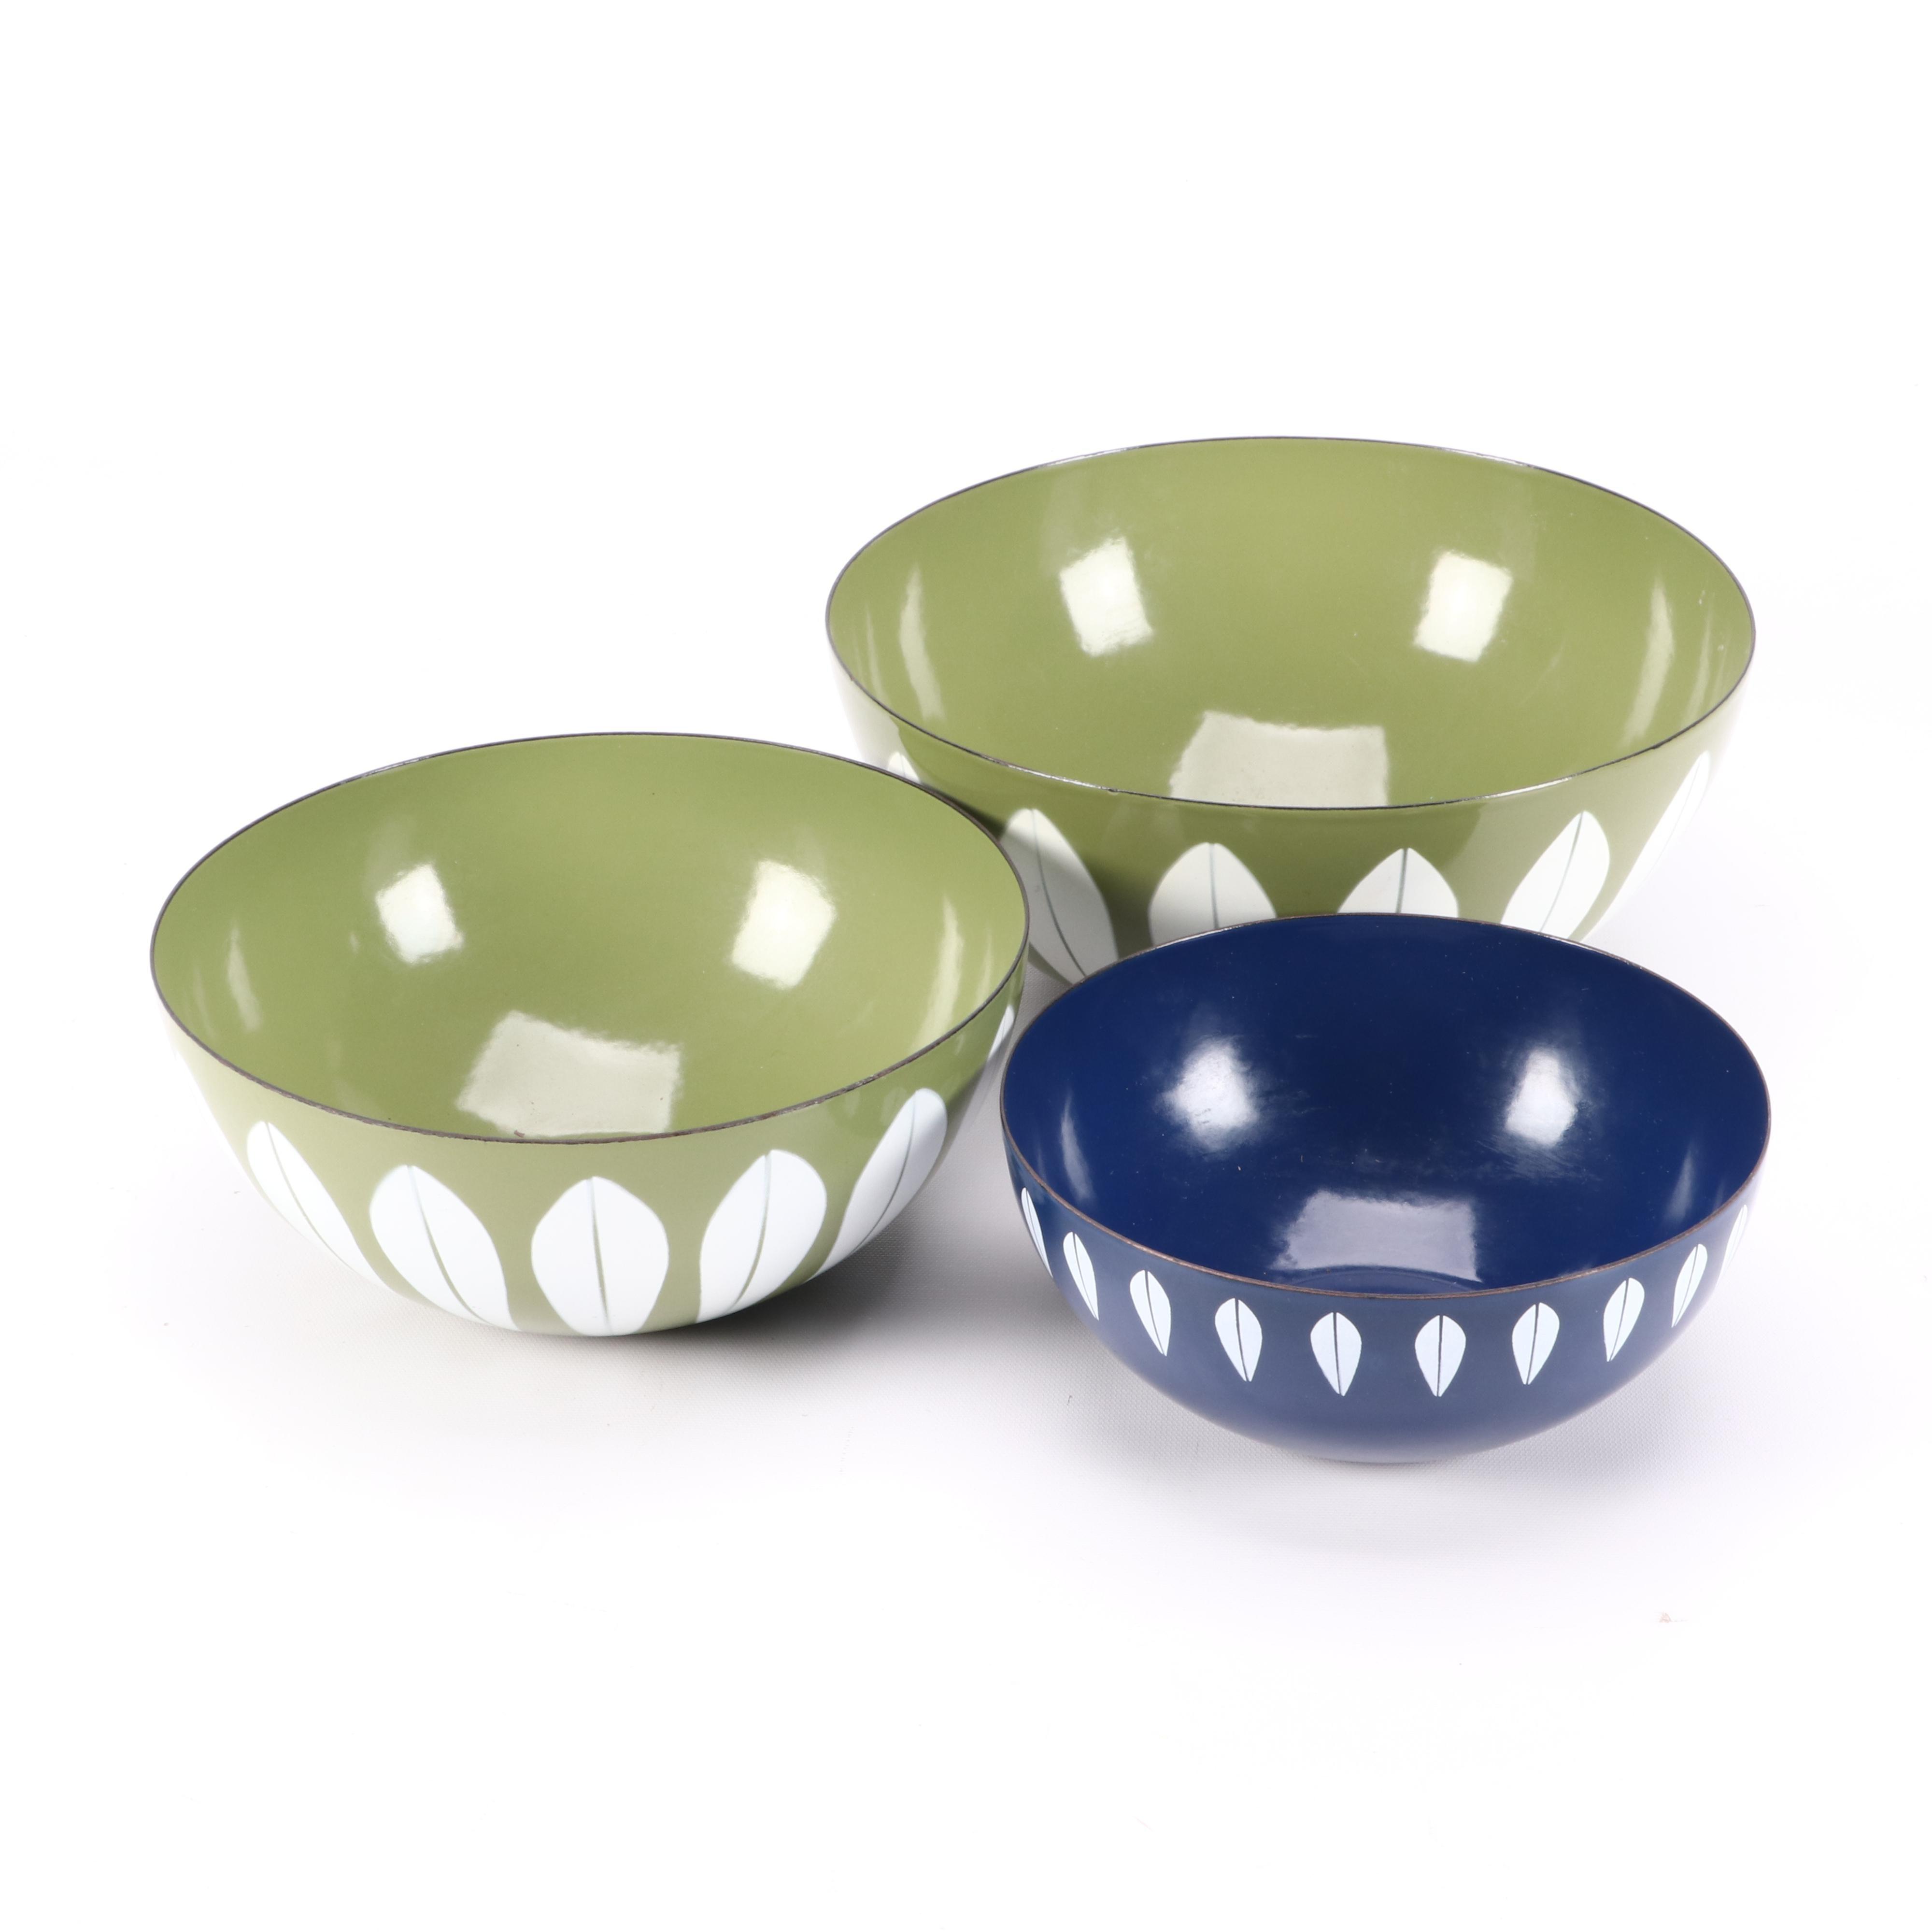 Vintage Cathrineholm Style Enameled Bowls